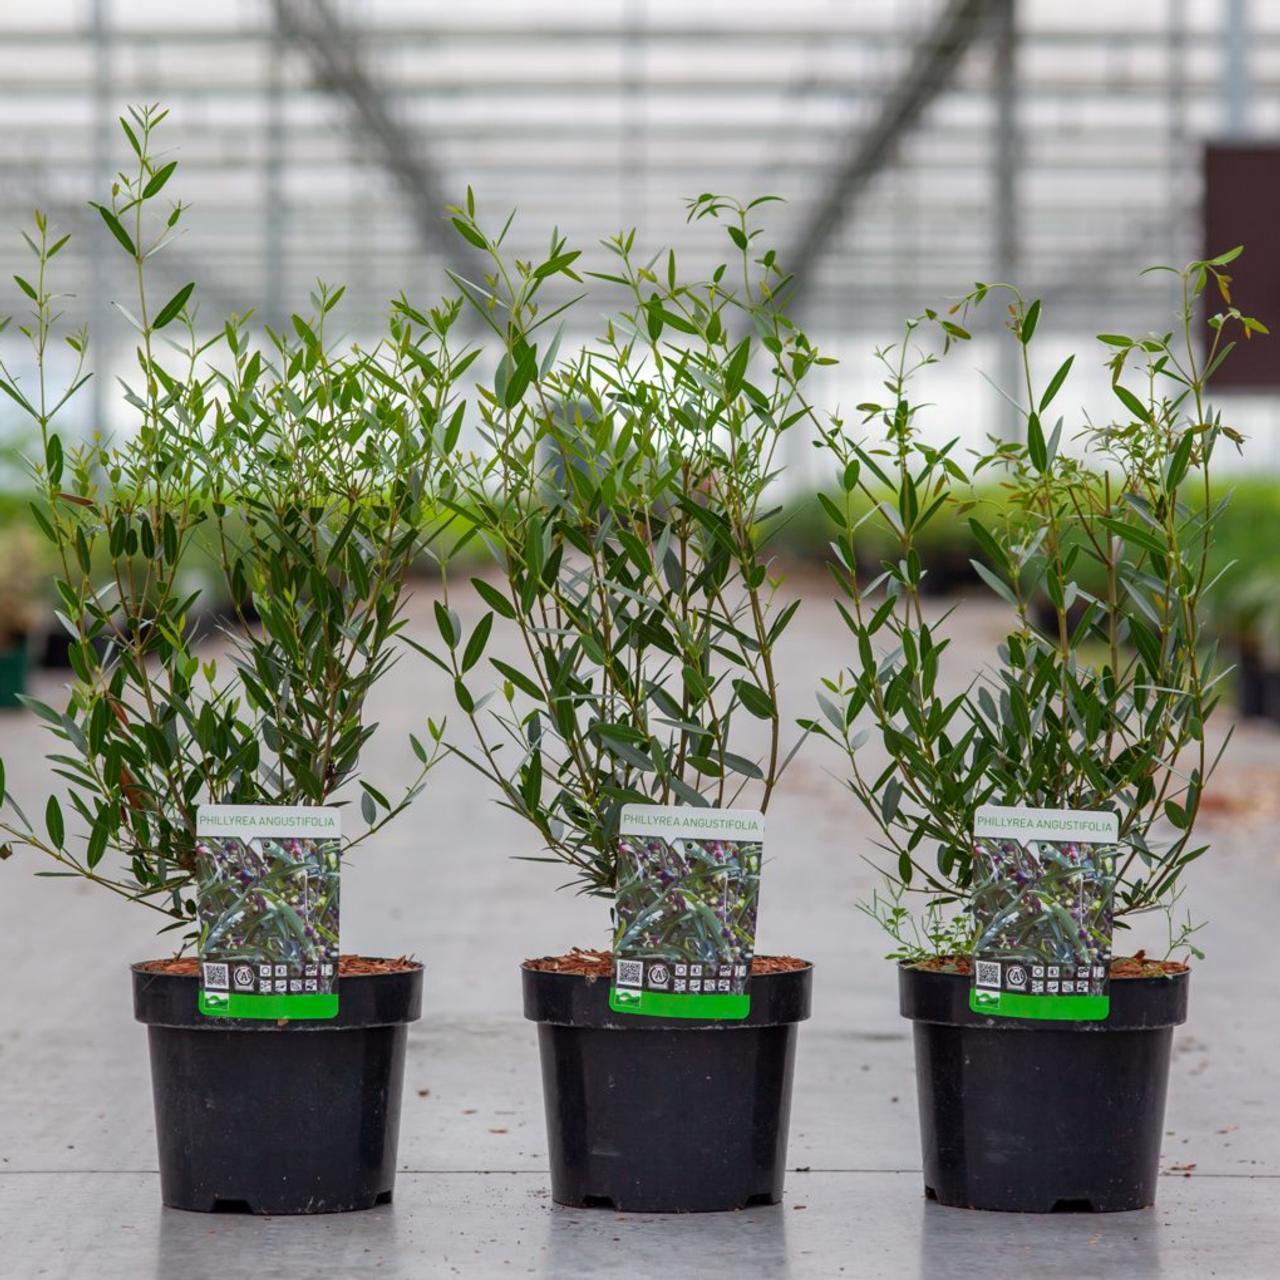 Phillyrea angustifolia plant